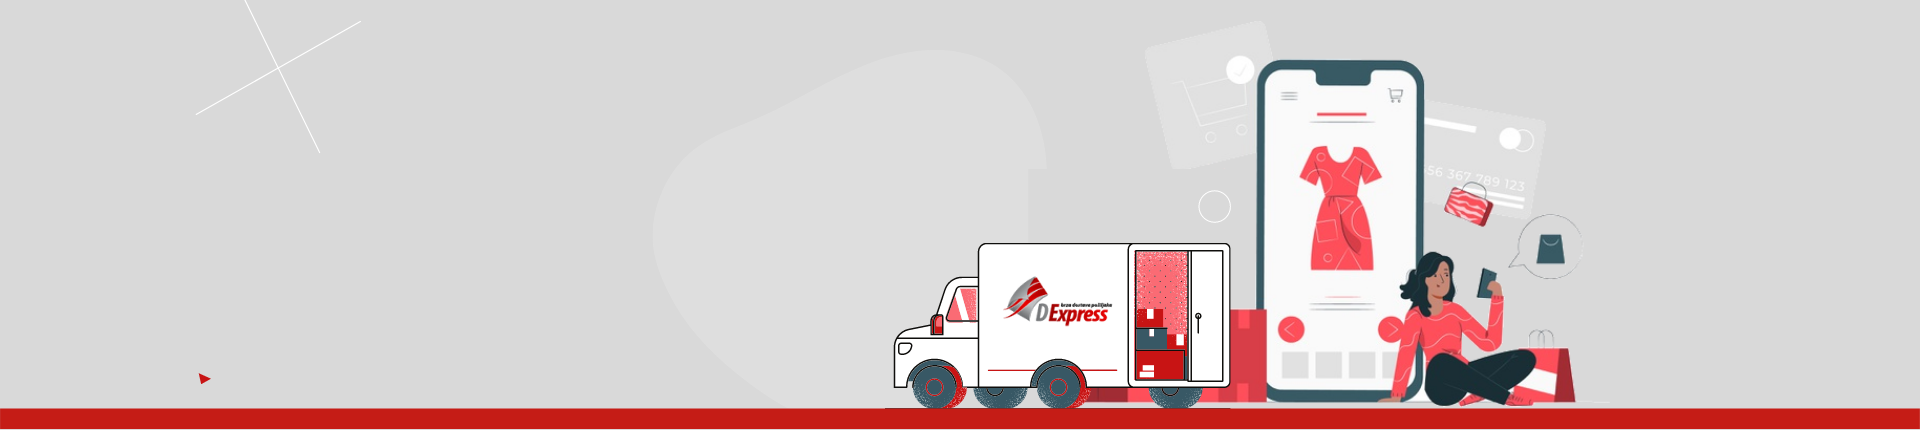 D Express </br> eCommerce